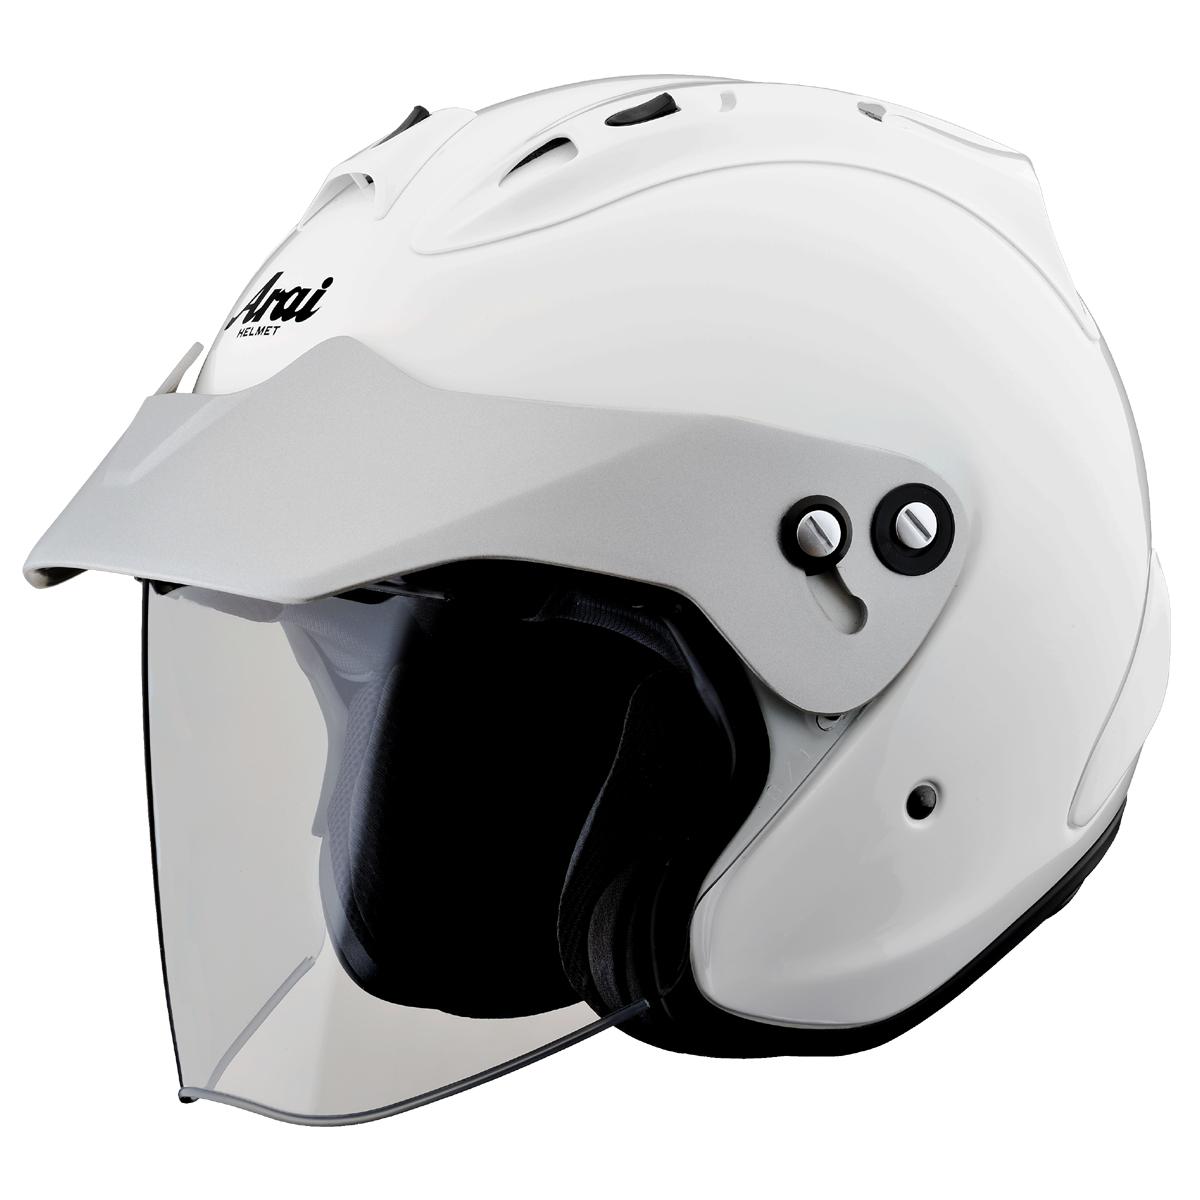 SZ-RAM4 SZ-RAM4 UPタウン ホワイト ホワイト 55~56cm 55~56cm ジェットヘルメット ARAI(アライ), 宇土市:87dc9d9d --- data.gd.no